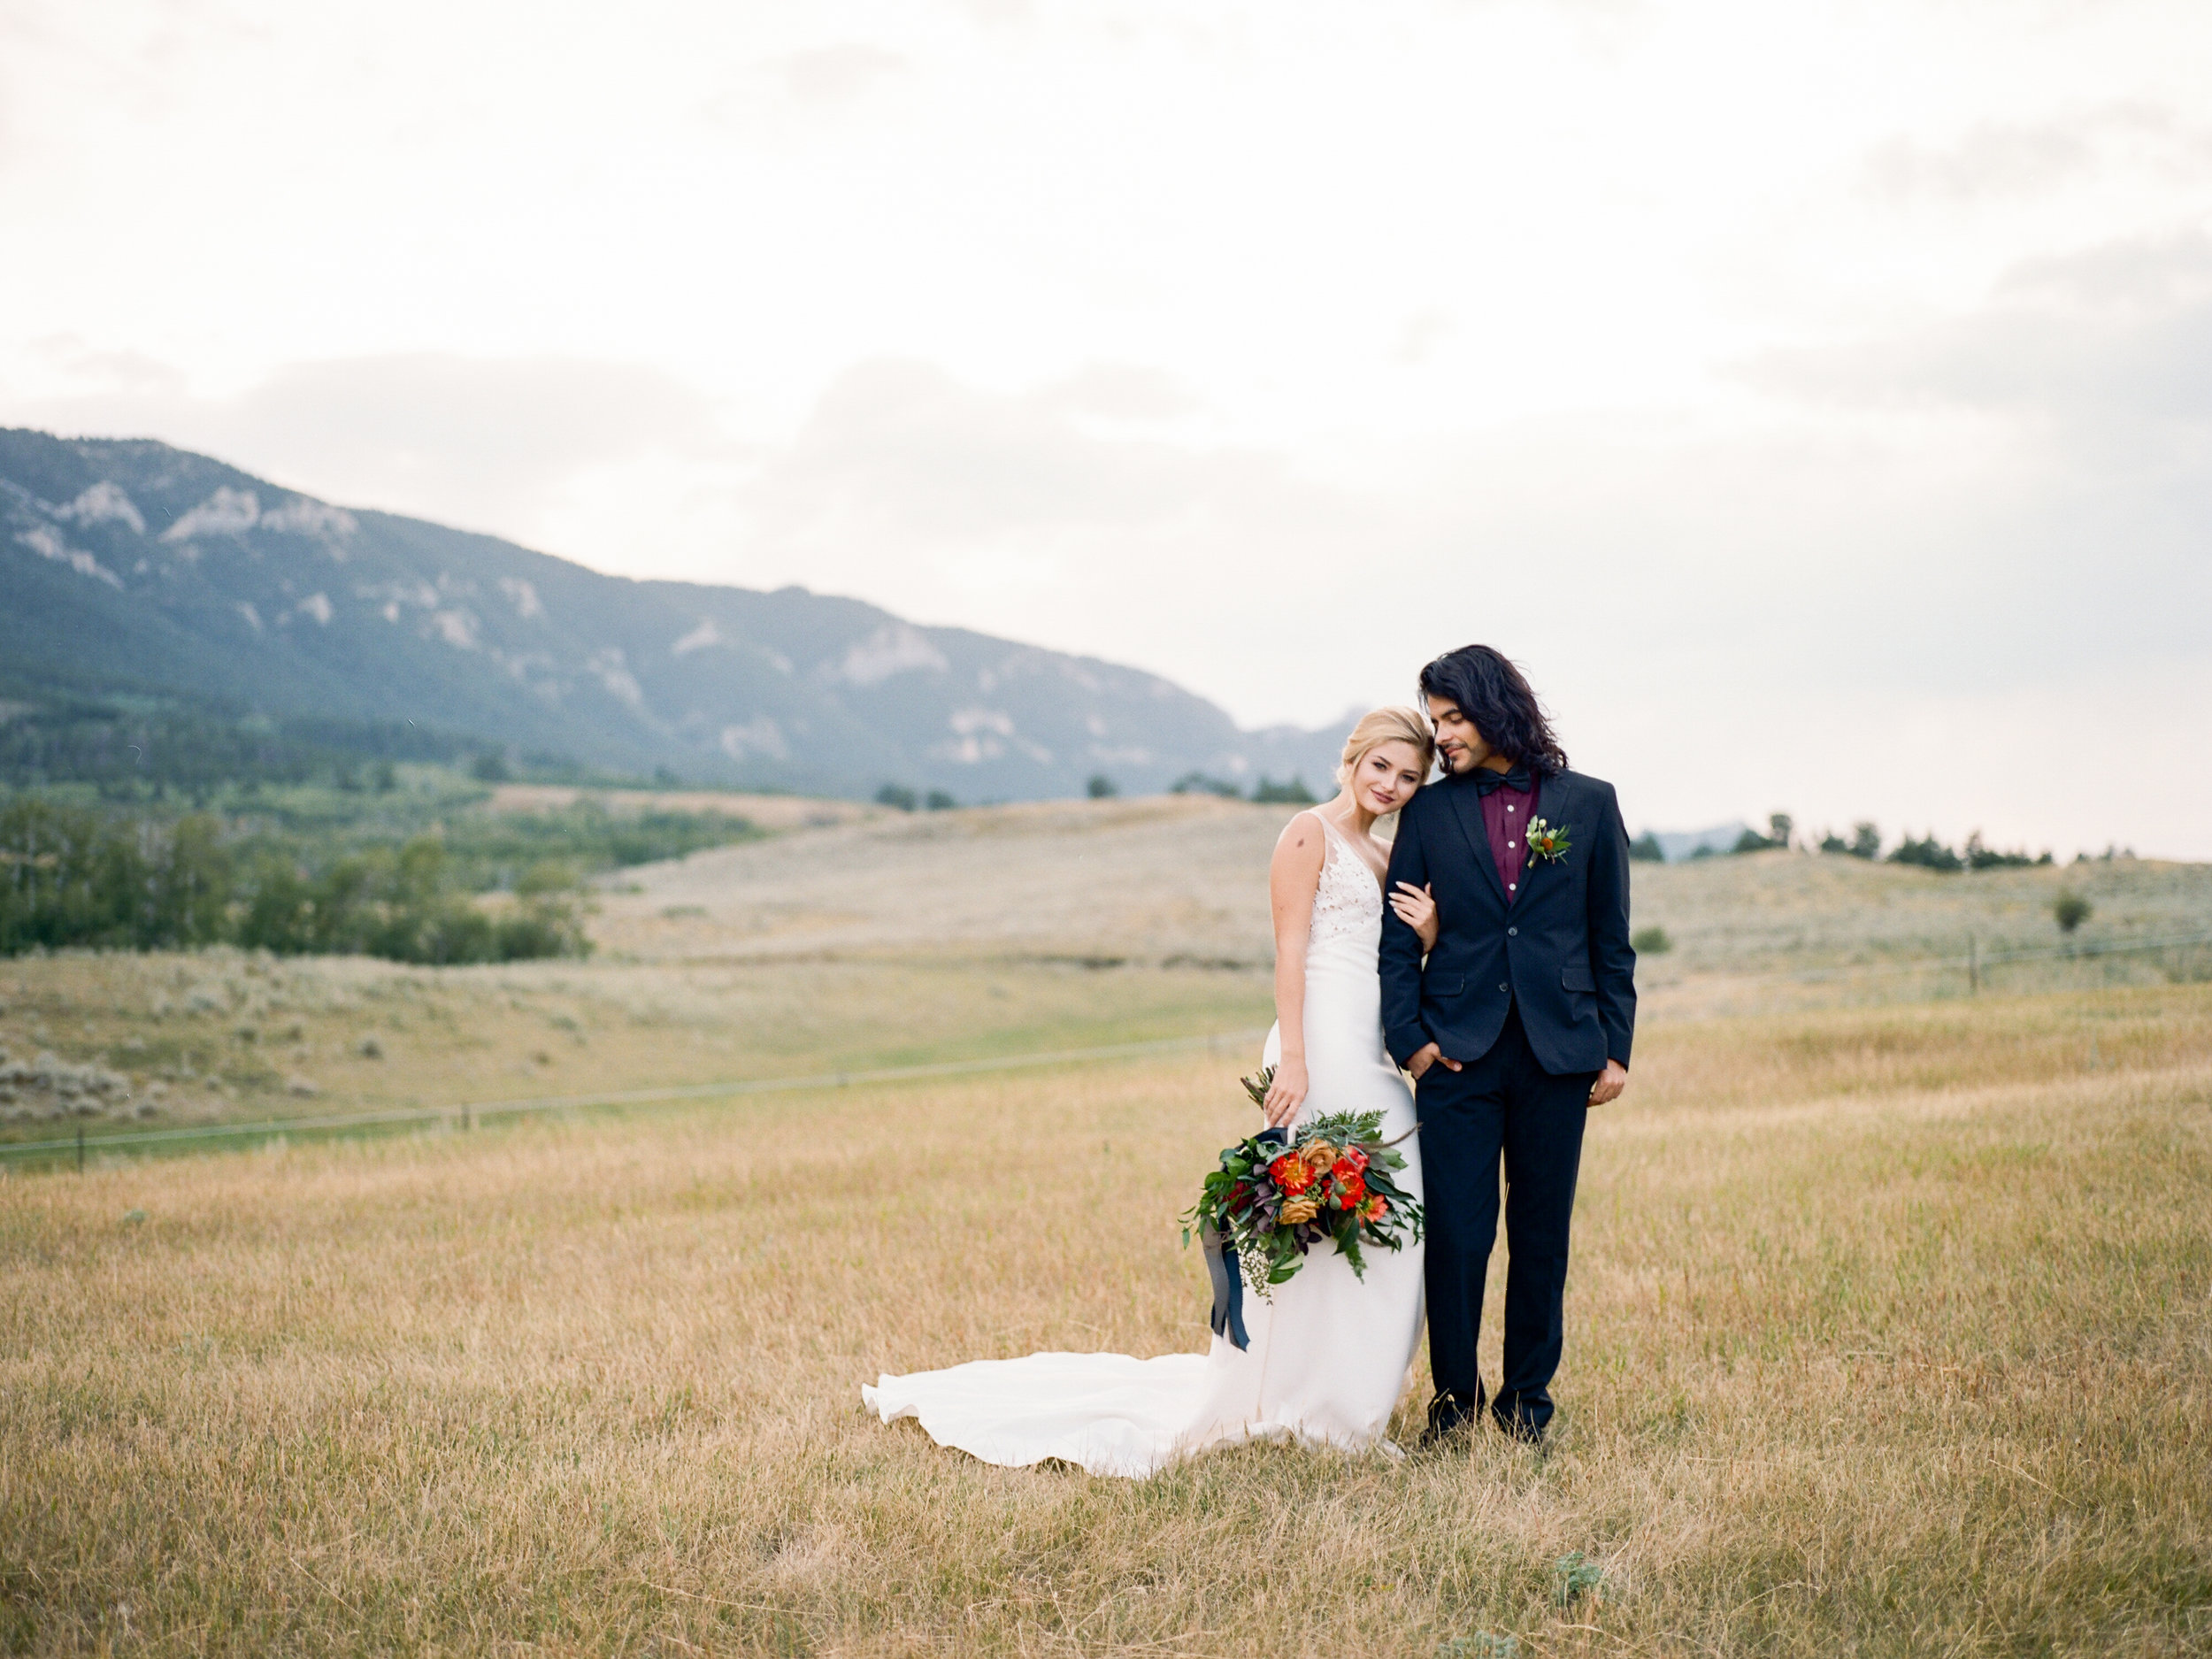 Bozeman-Big Sky-Montana-wedding-engagement-family-photographer-0159.jpg